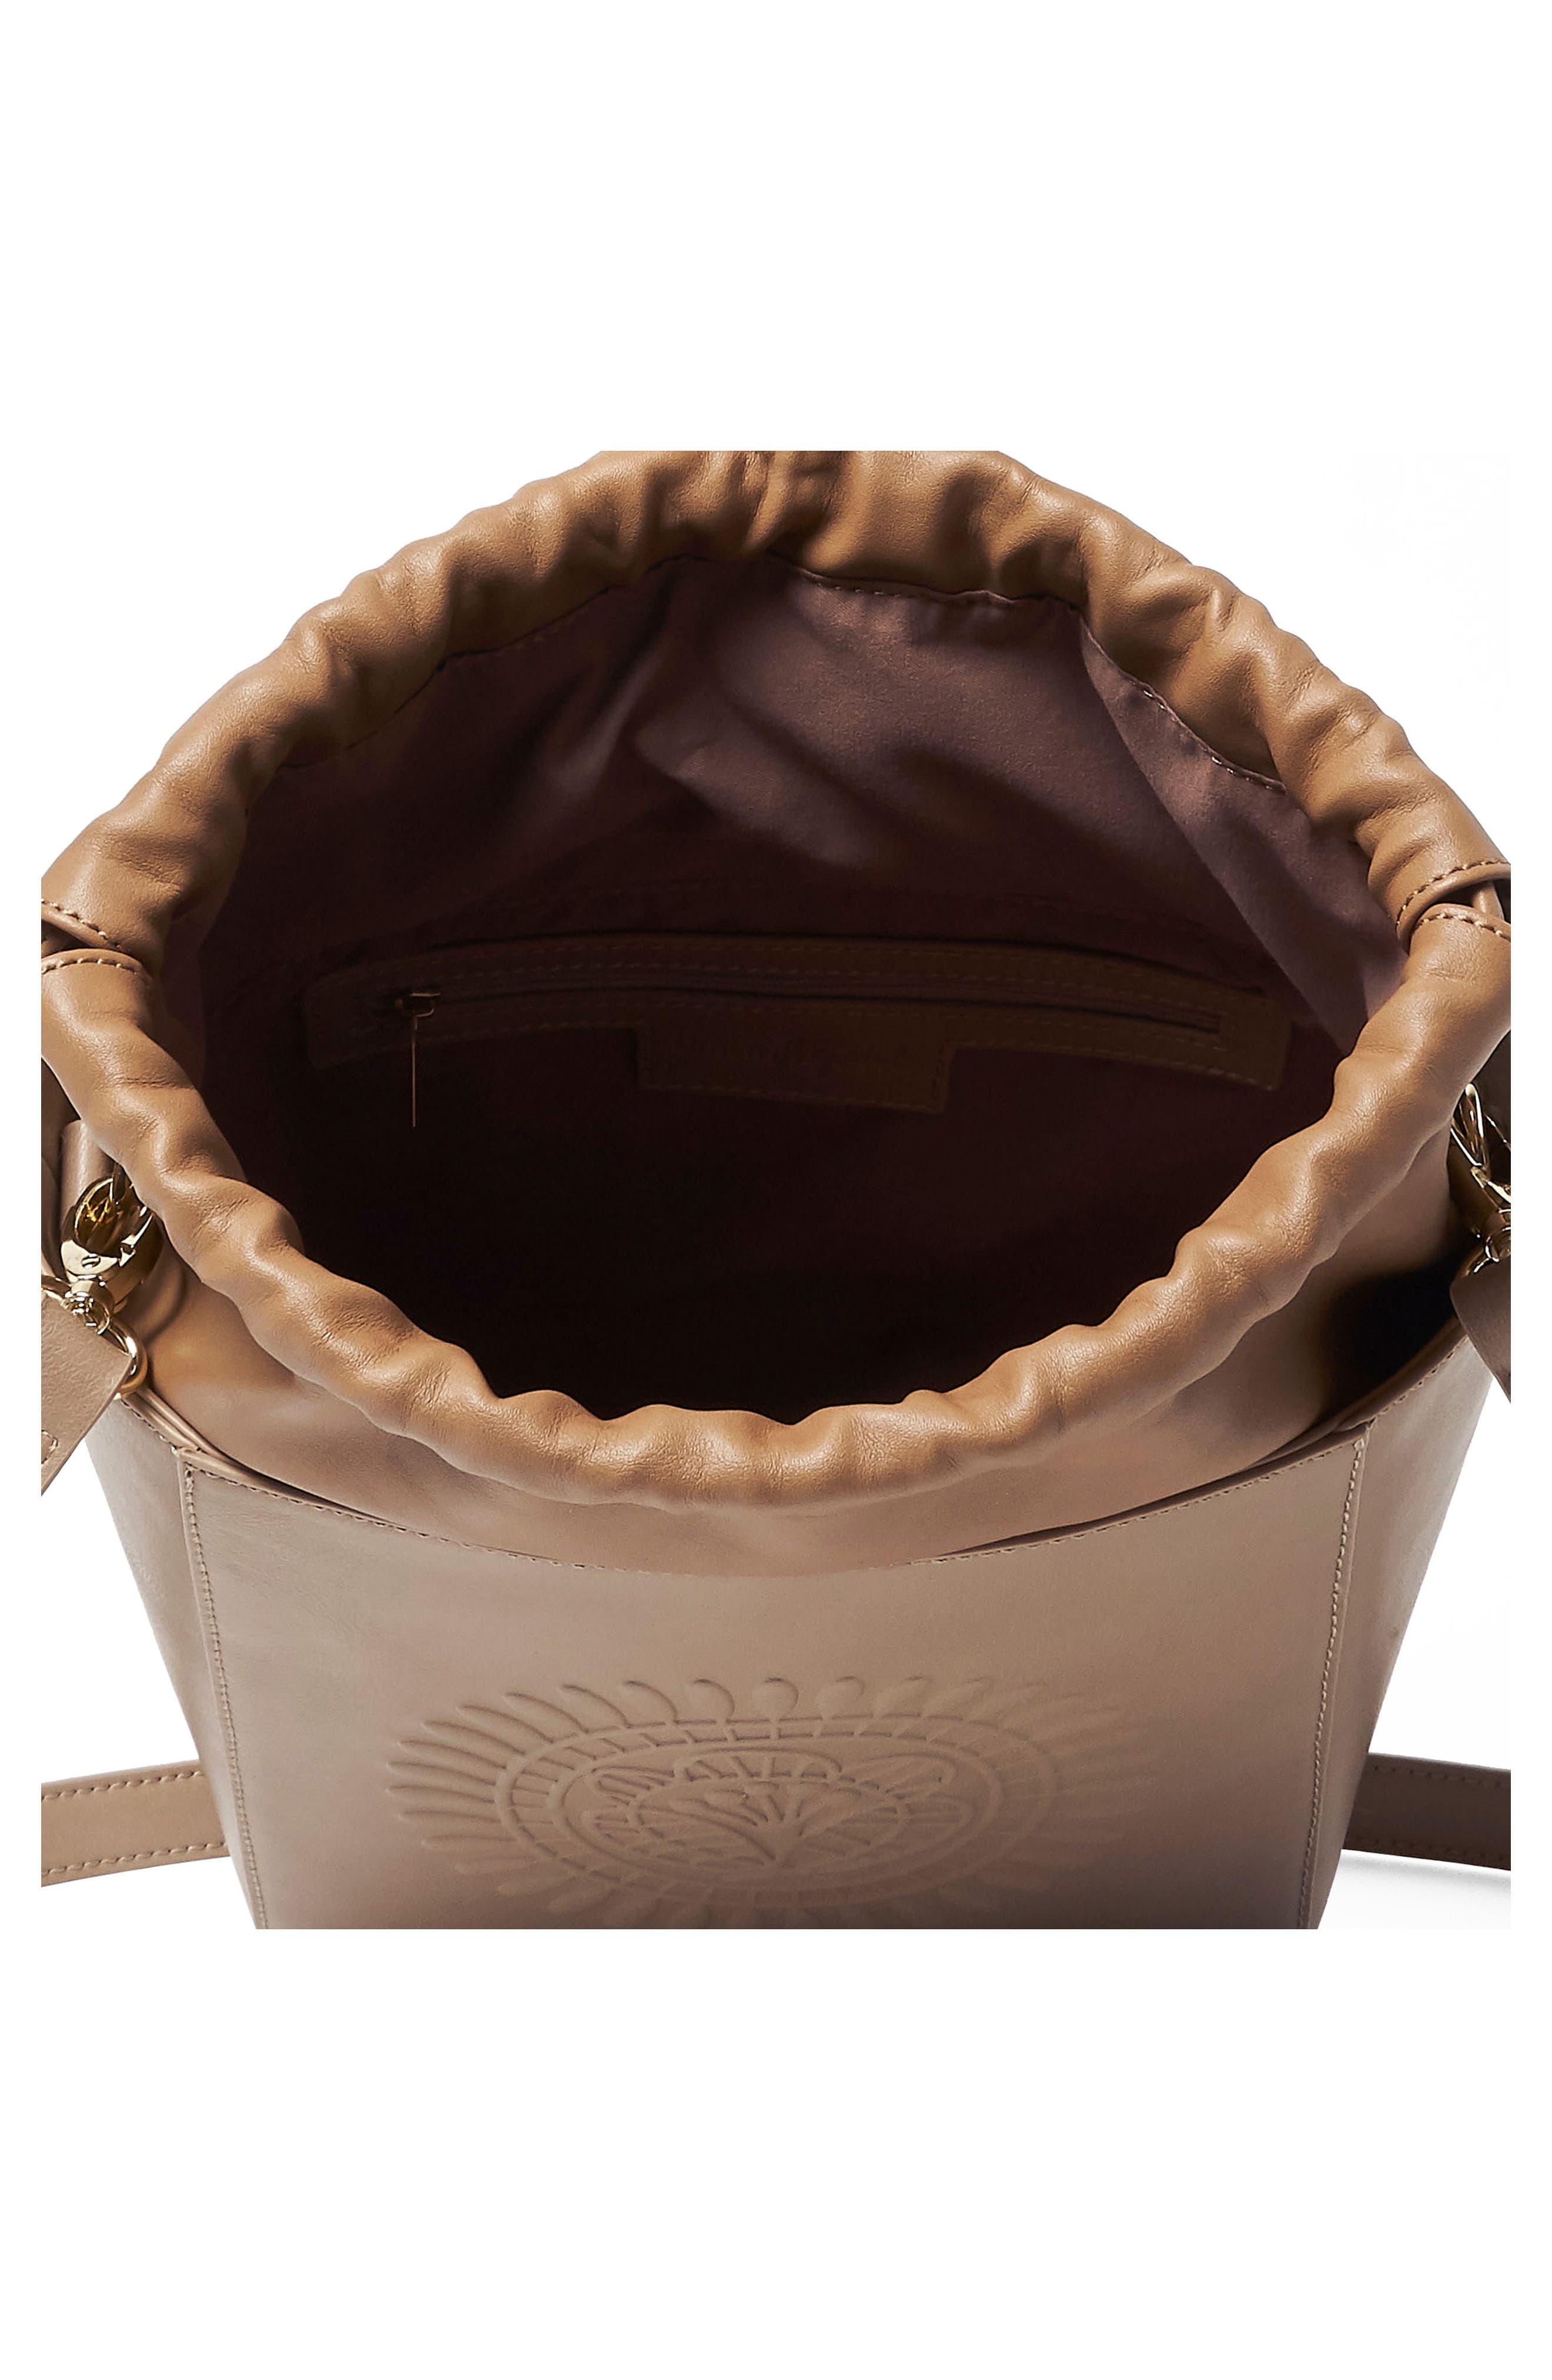 Wanderer Vegan Leather Bucket Bag,                             Alternate thumbnail 4, color,